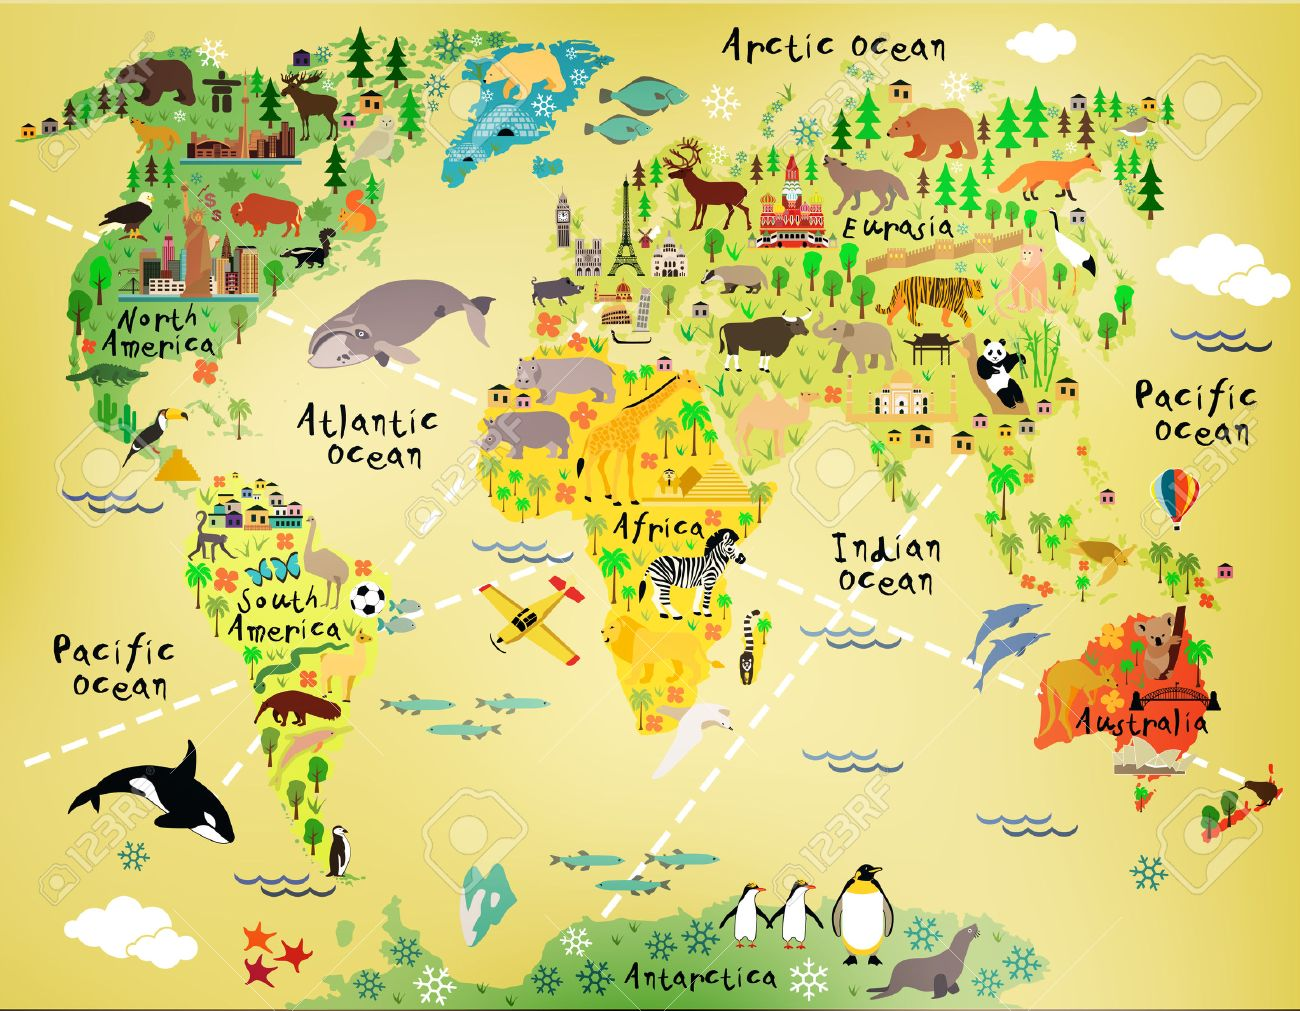 Cartoon World Map Royalty Free Cliparts Vectors And Stock - World map america